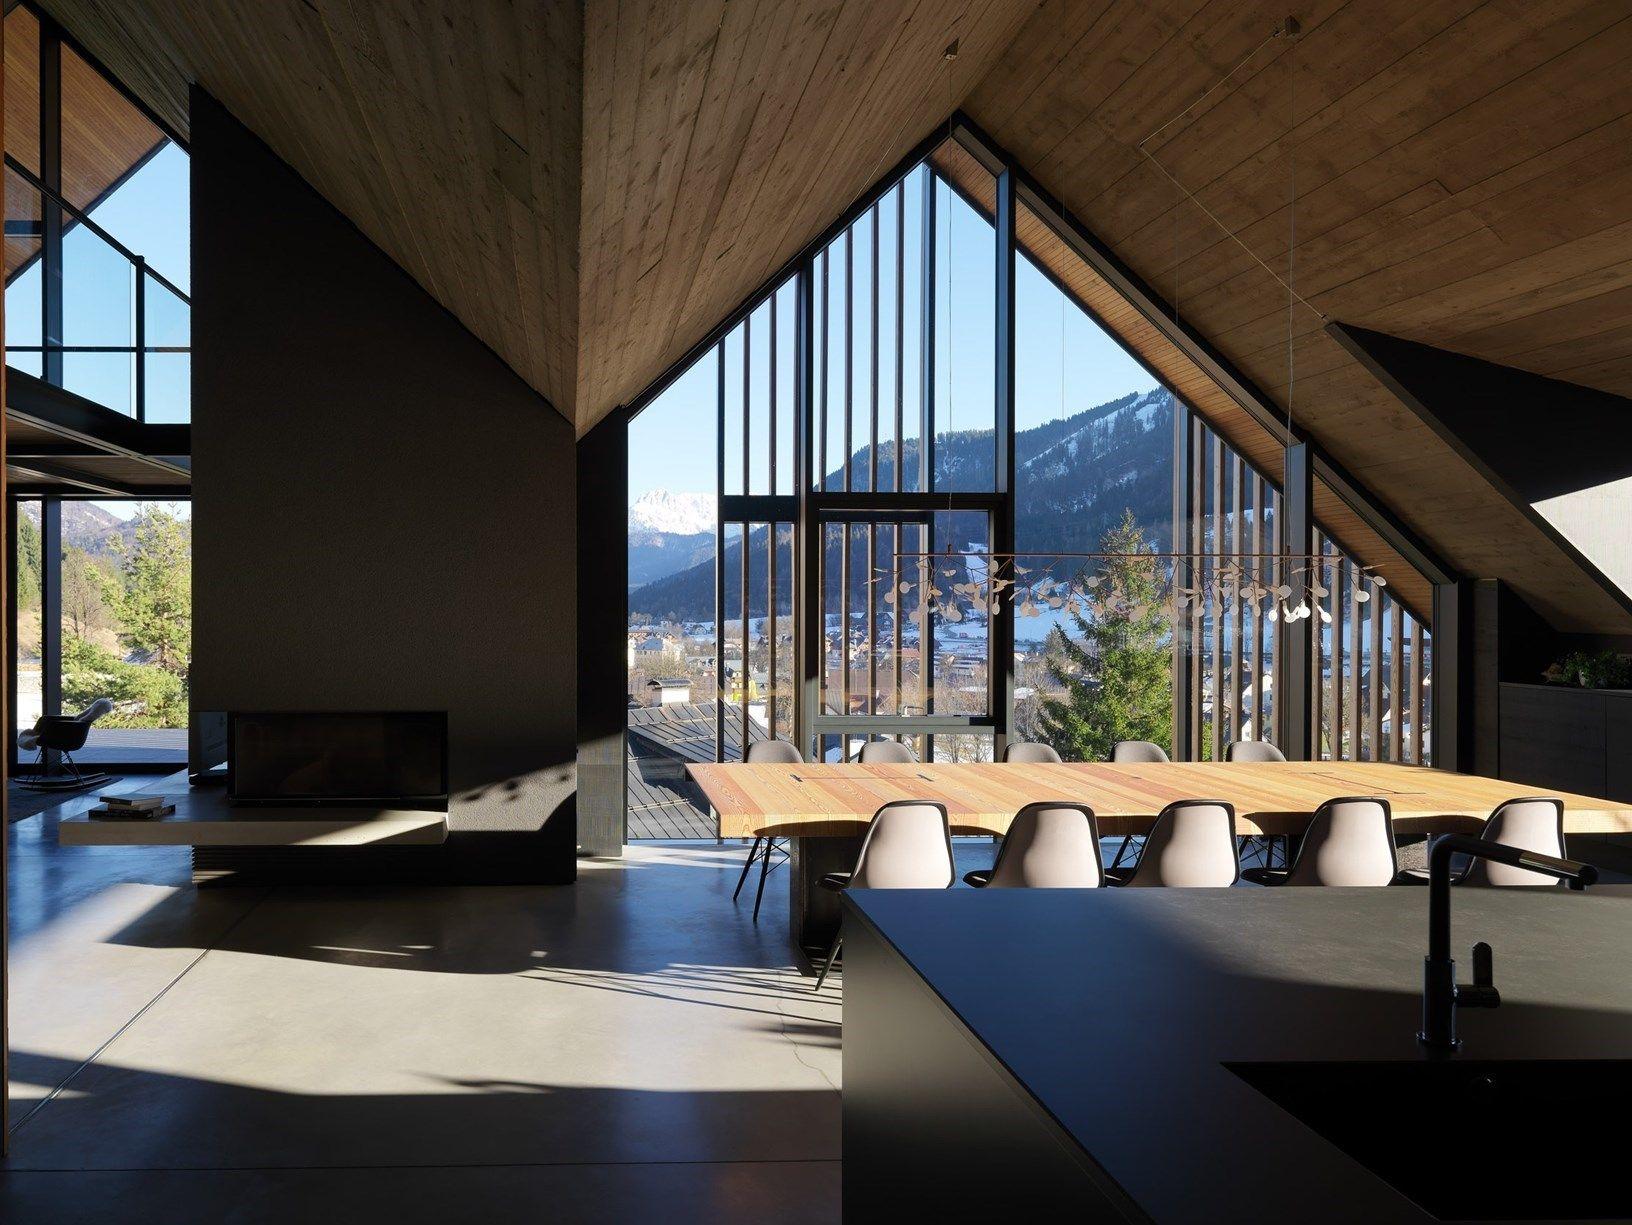 A Camporosso la casa alpina di GEZA